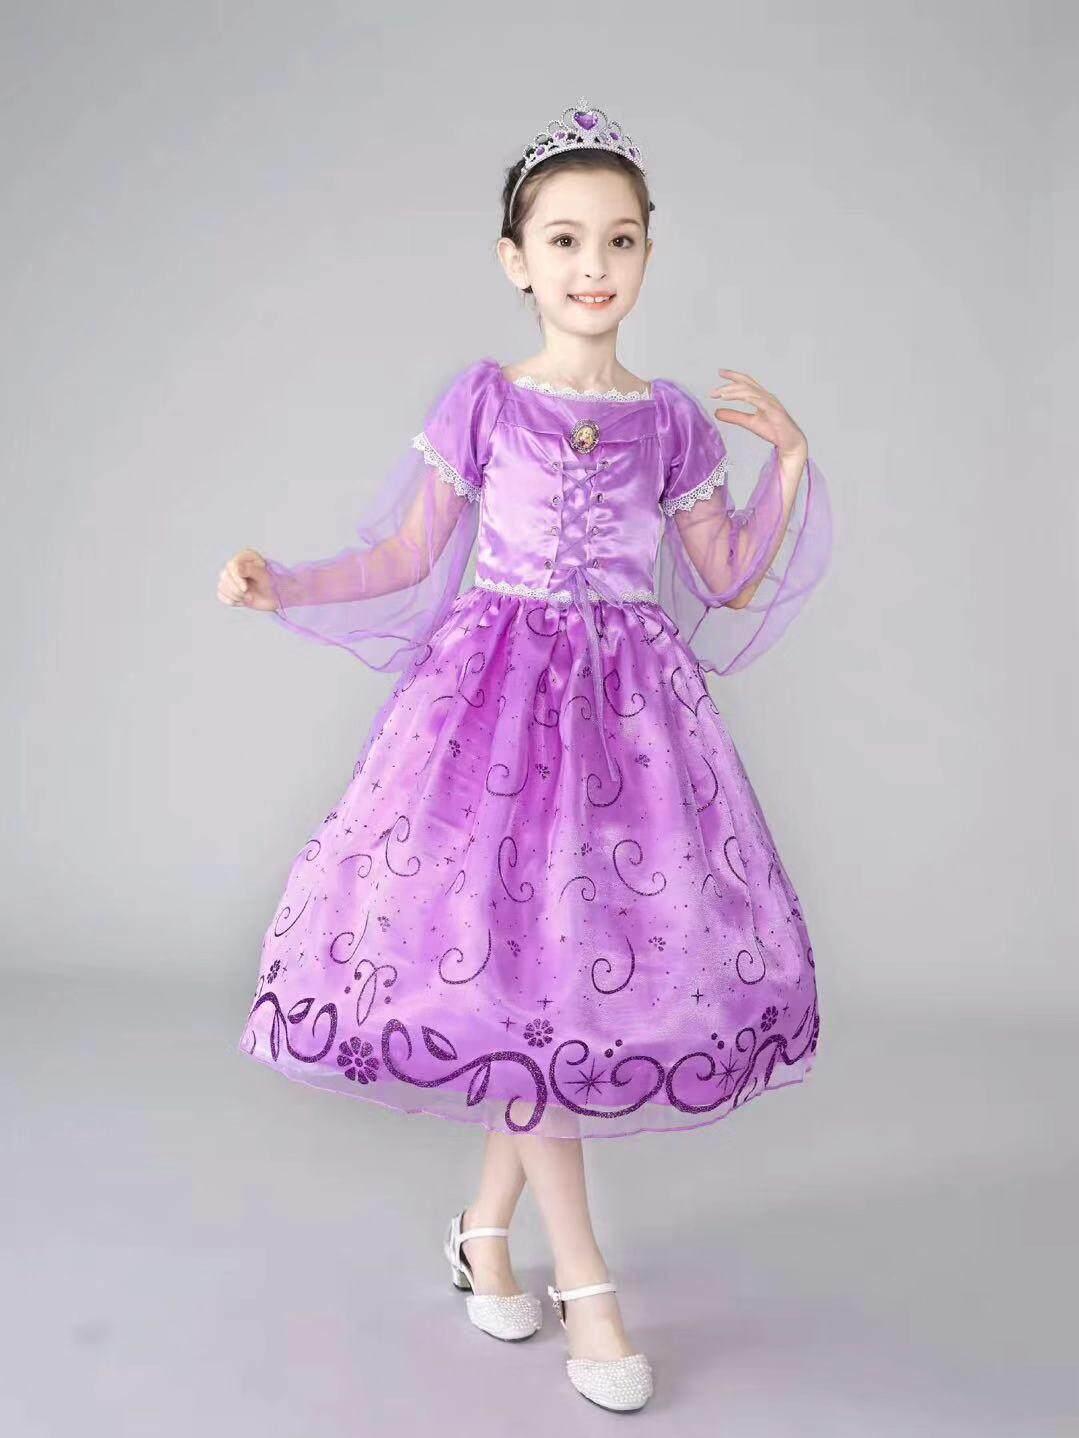 CY 9193 MUSLIMAH MUSLIM DISNEY PRINCESS DRESS COSTUME RAPUNZEL